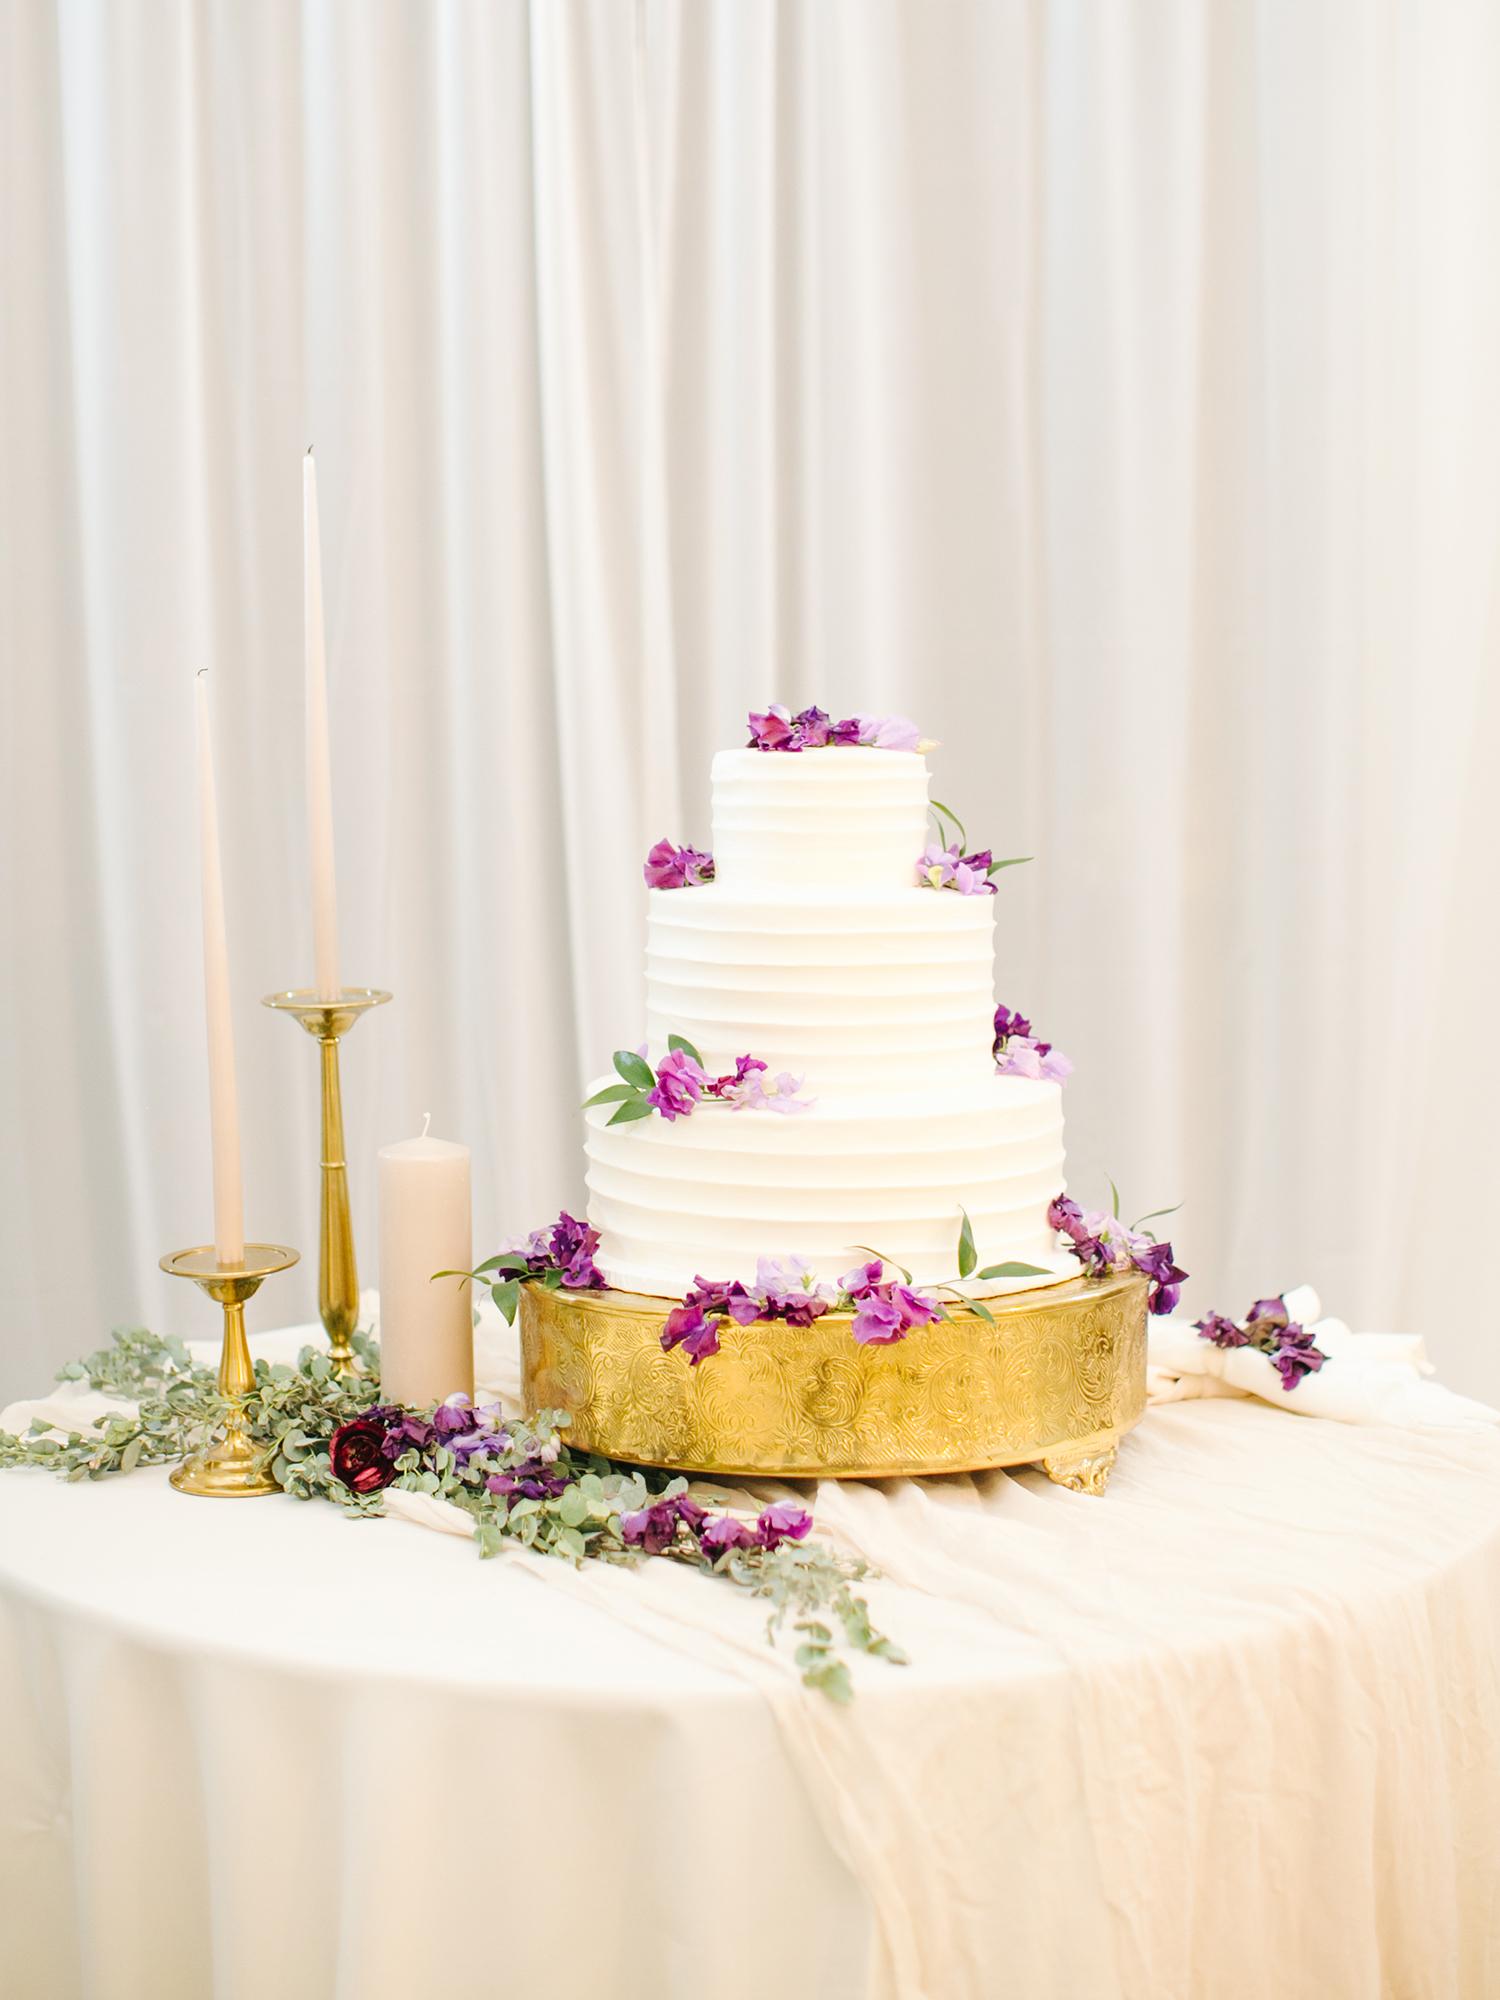 molly josh wedding cake on golden stand